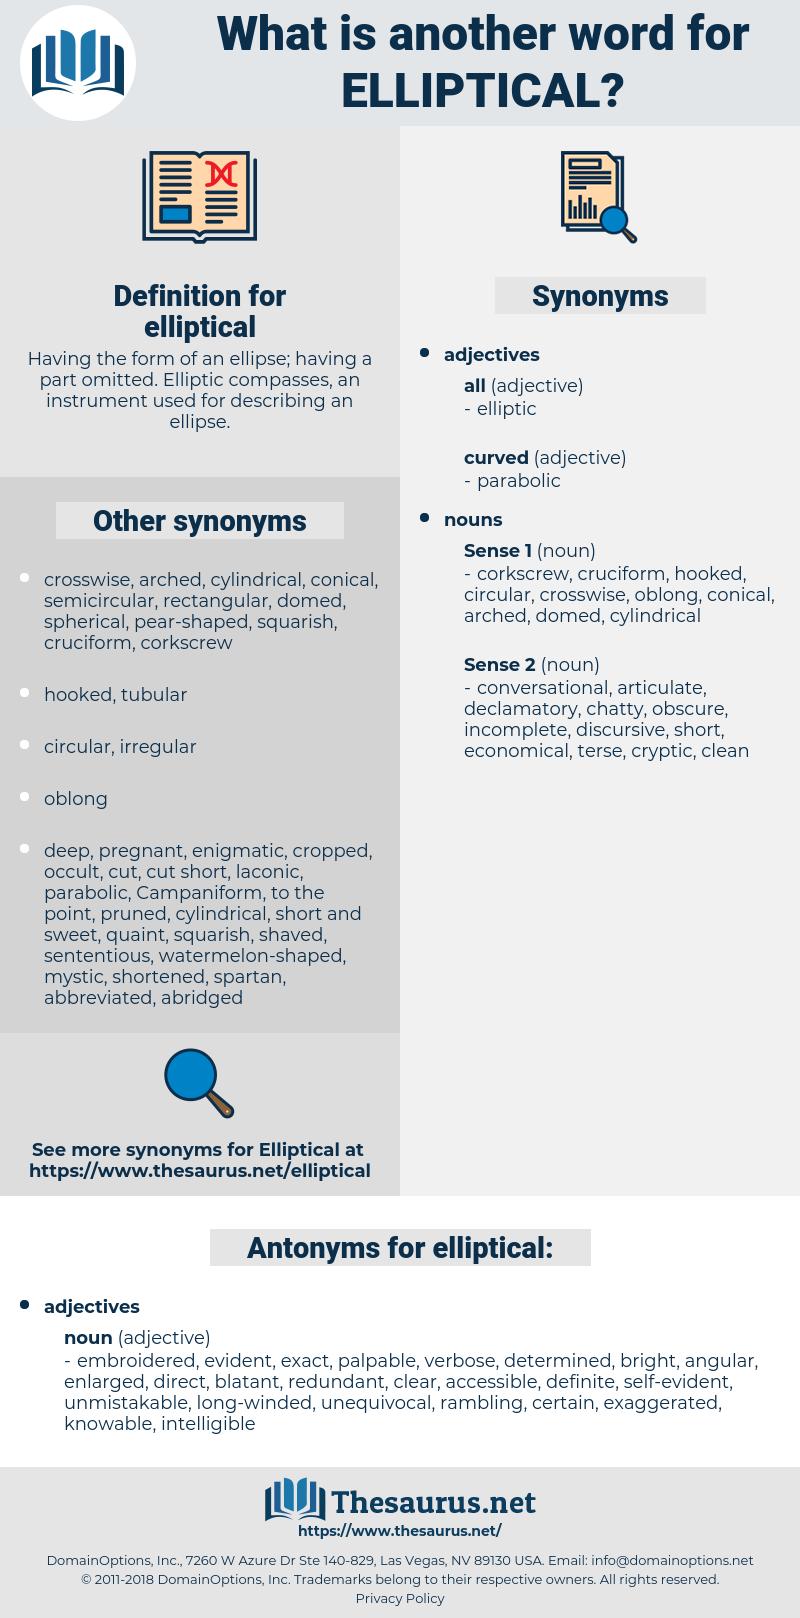 elliptical, synonym elliptical, another word for elliptical, words like elliptical, thesaurus elliptical